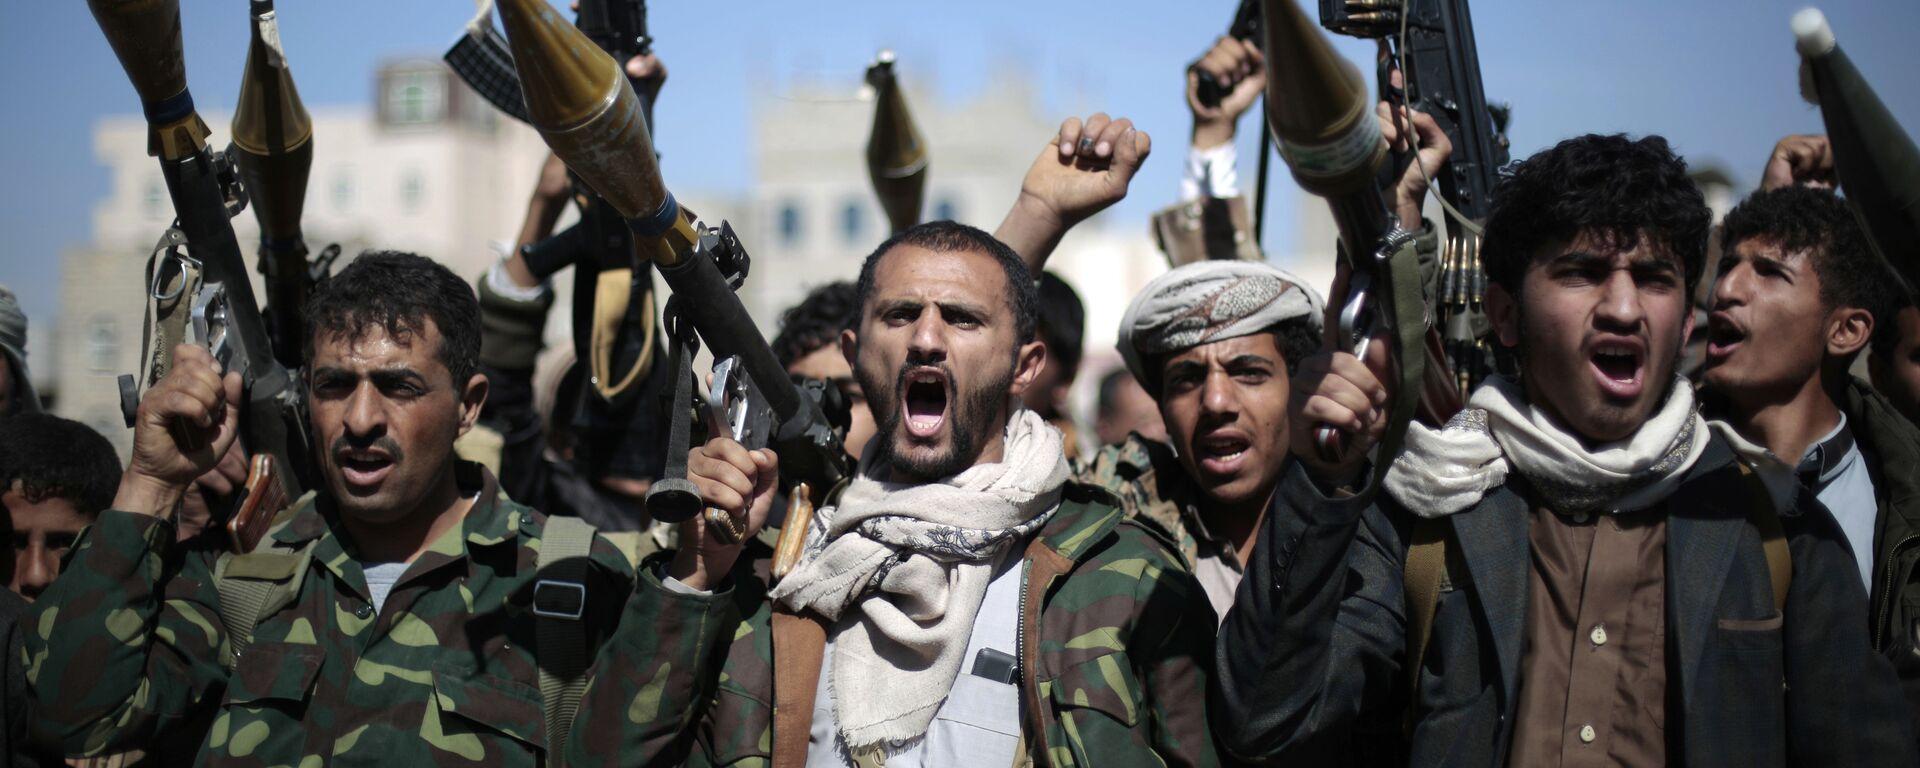 Rebeldes hutíes en Yemen (archivo) - Sputnik Mundo, 1920, 13.01.2021